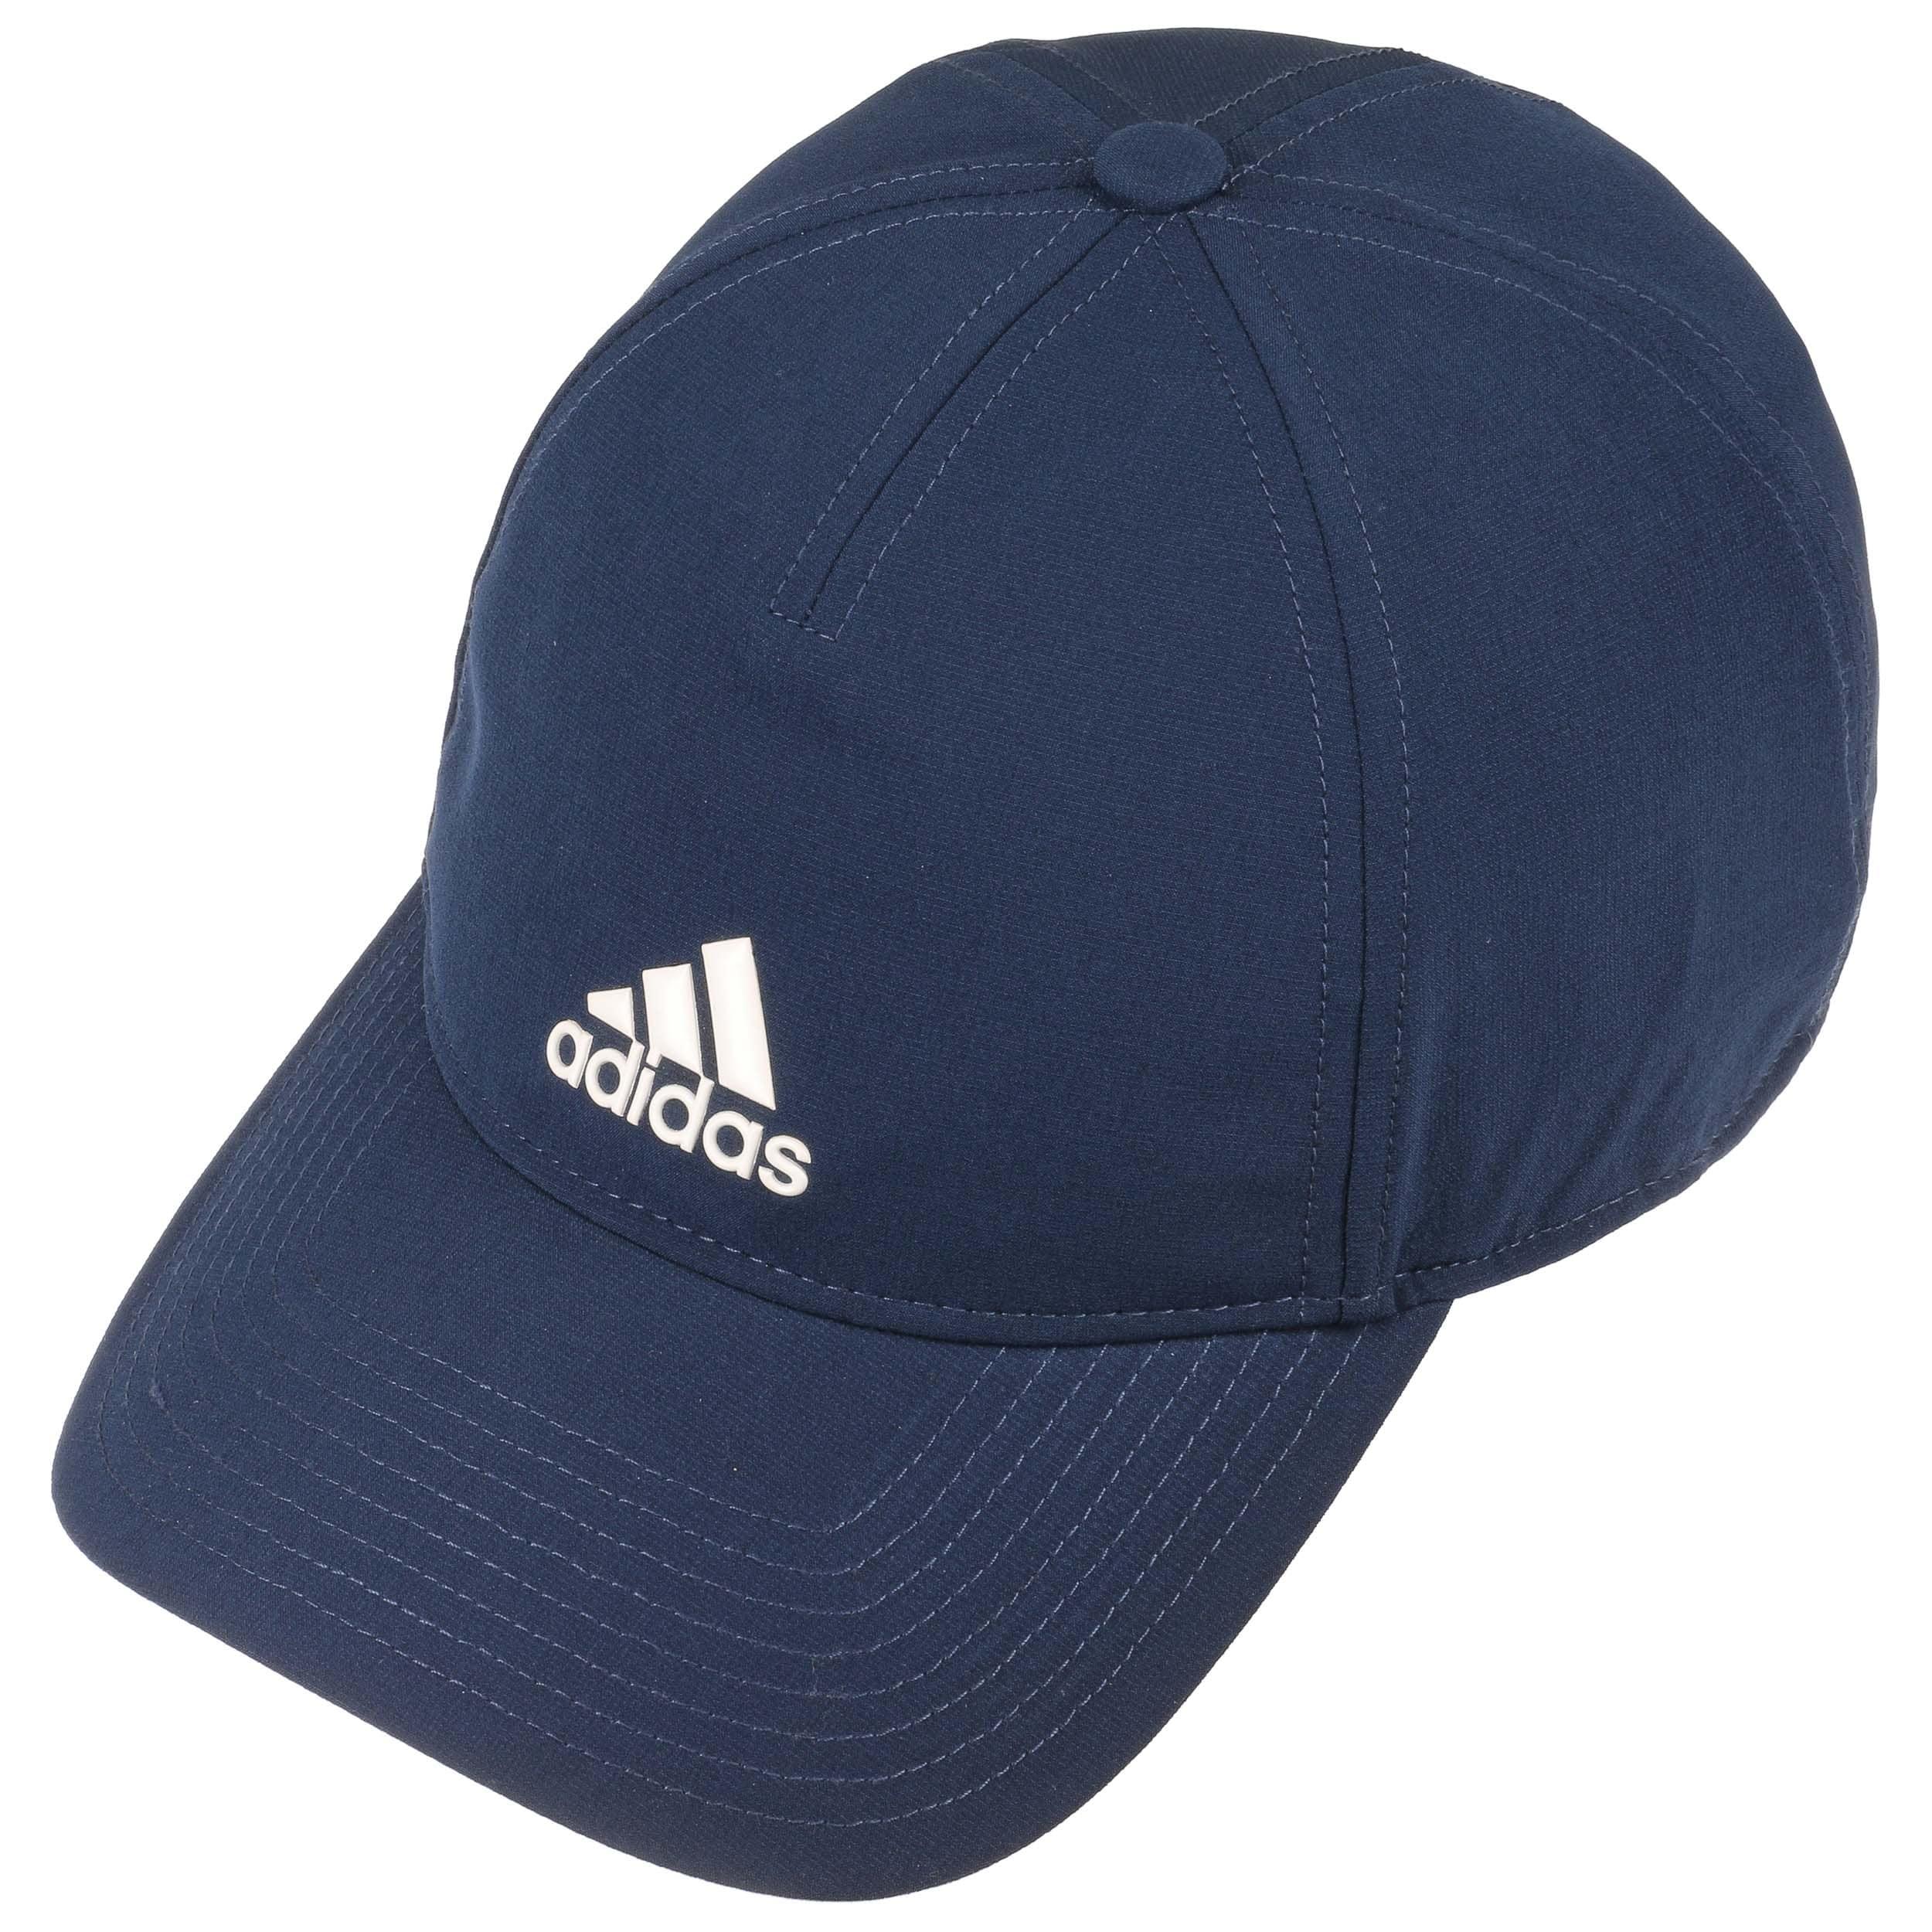 ddde6e524b3 ... navy 1 · C40 5P Climalite Cap by adidas - blue-white 1 ...